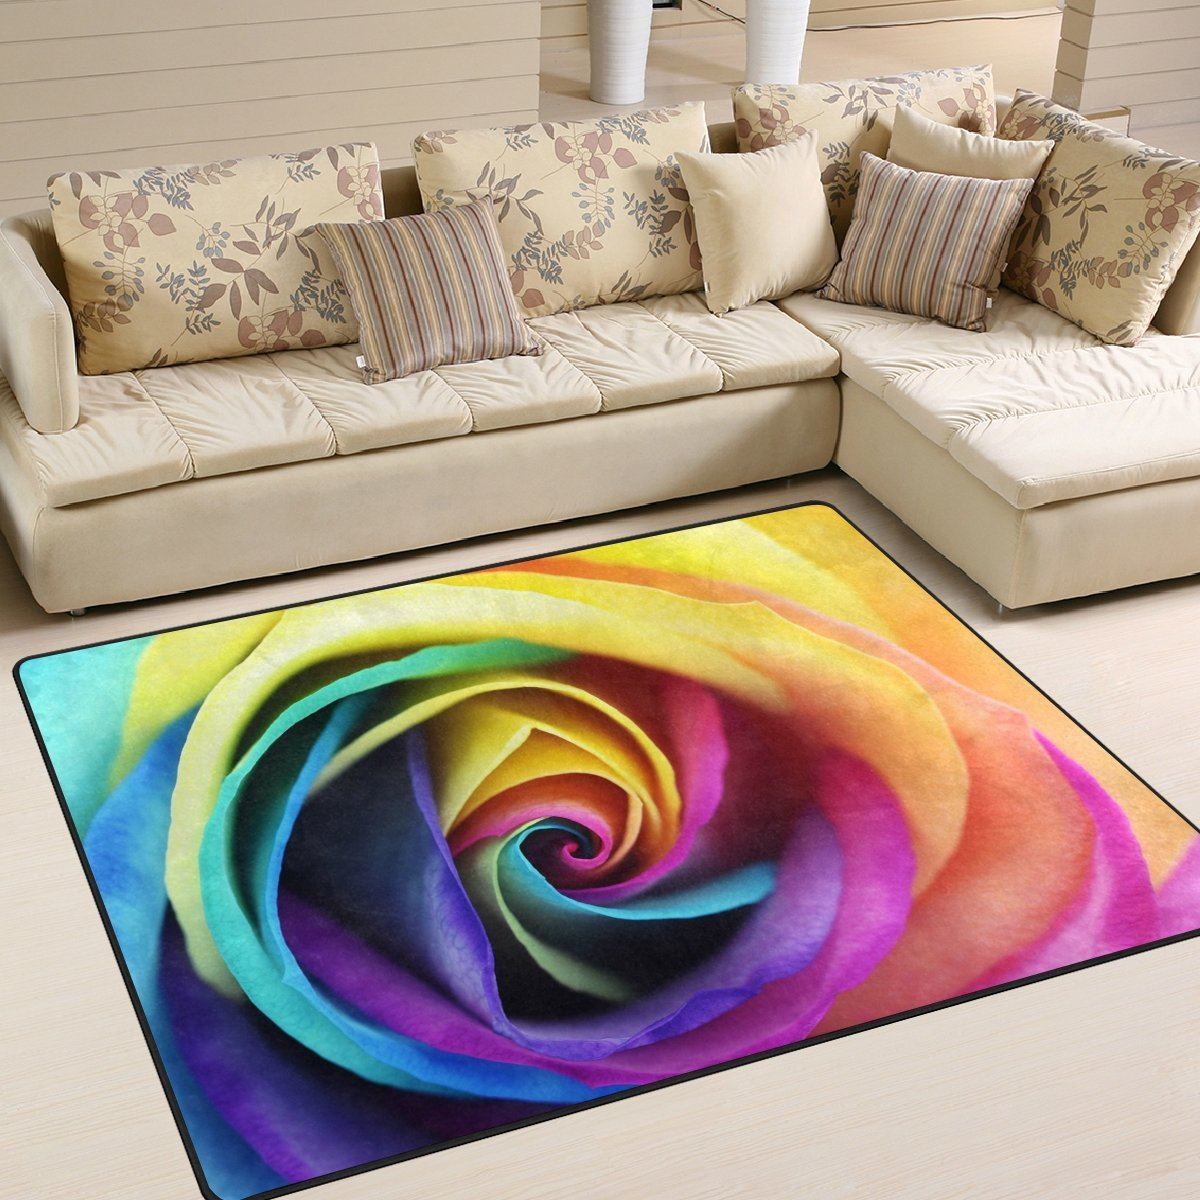 Colorful Rainbow Rose Flower Rug Thewowdecor